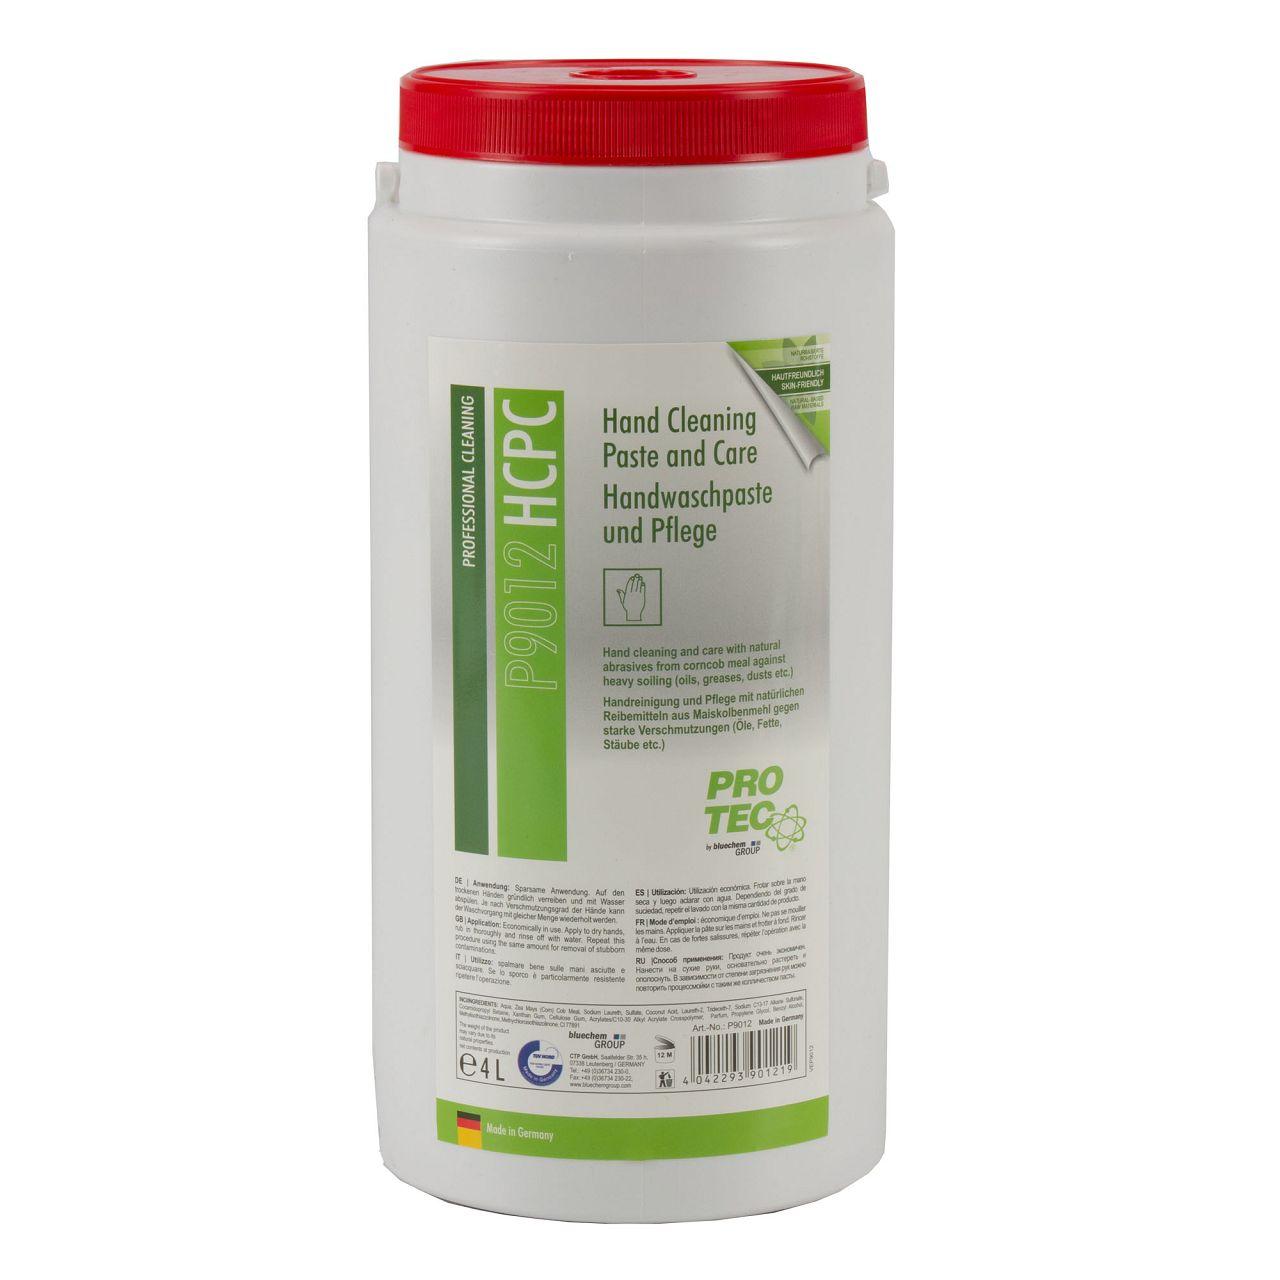 PROTEC P9012 HCPC Hand Cleaning Paste and Care Handwaschpaste und Pflege 4 Liter